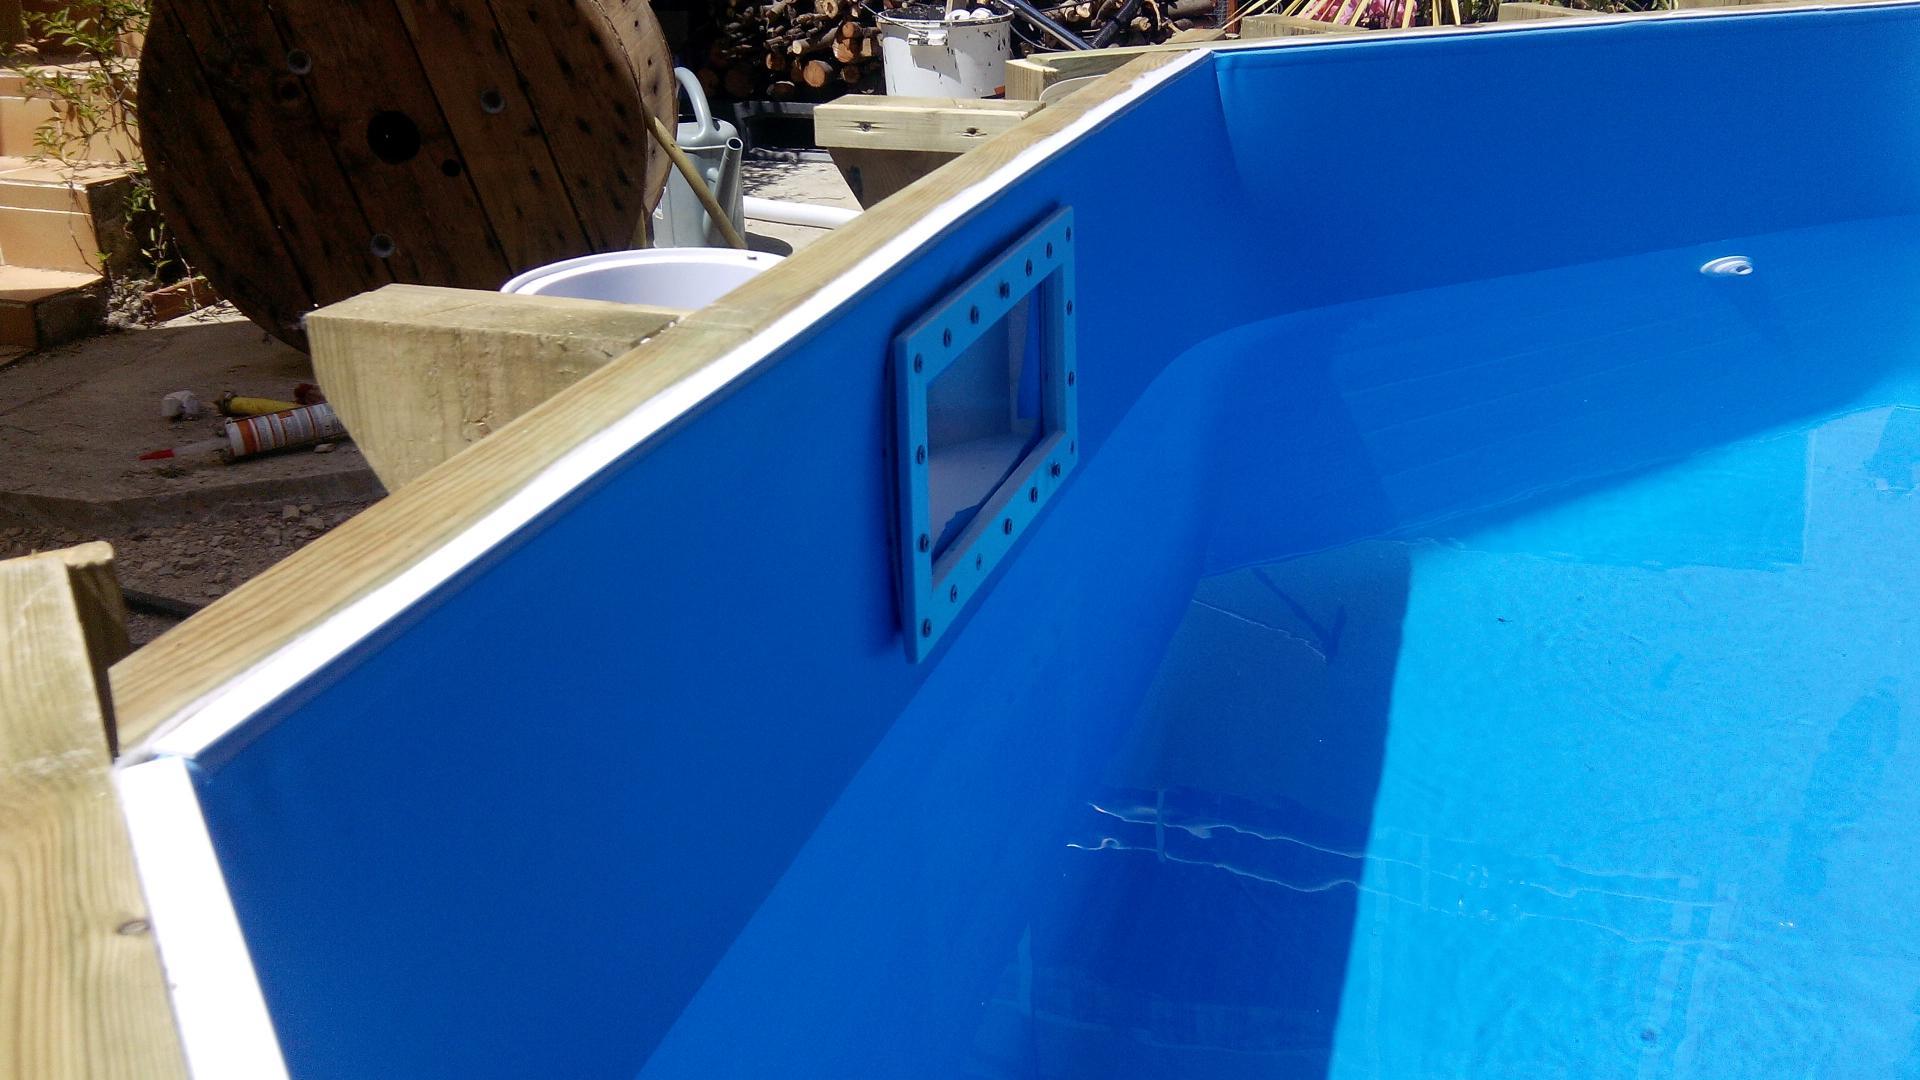 Montage et installation de piscine en kit a montpellier - Piscine montpellier mosson ...